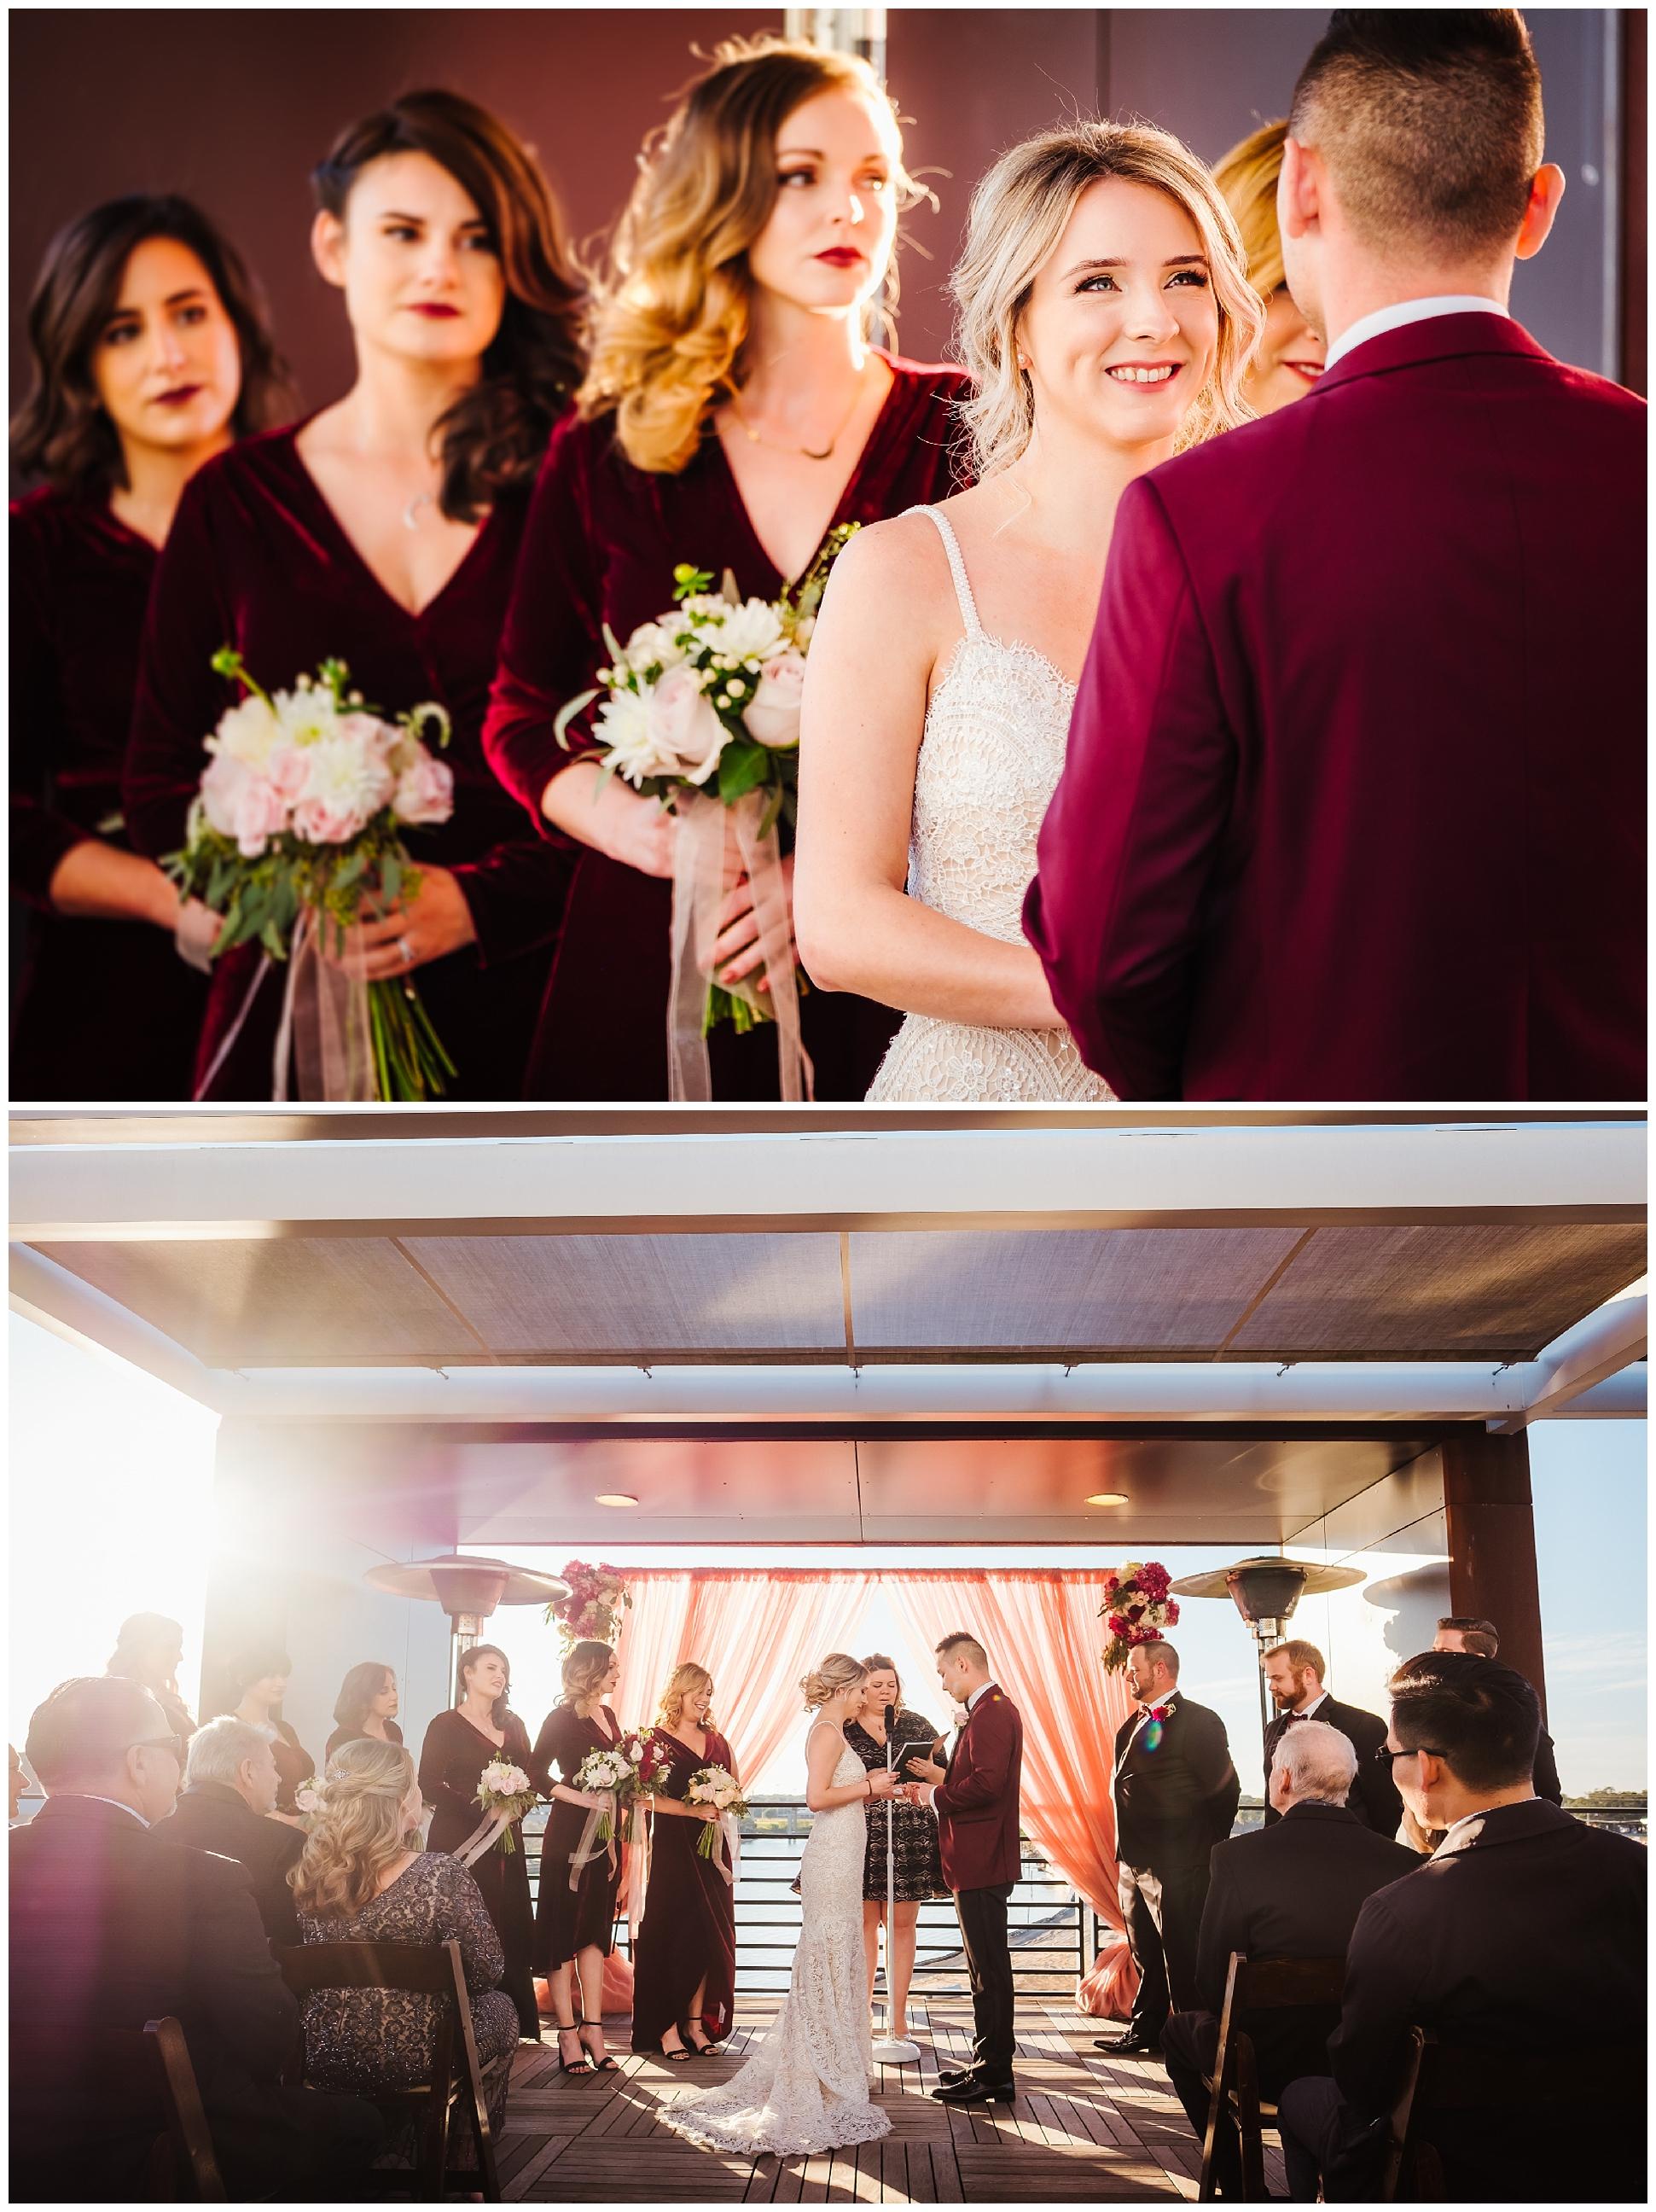 tampa-armeture-wedding-photographer-edgy-industrial-downtown-fancy-free-nursery-tattoo-burgandy-velvet_0048.jpg